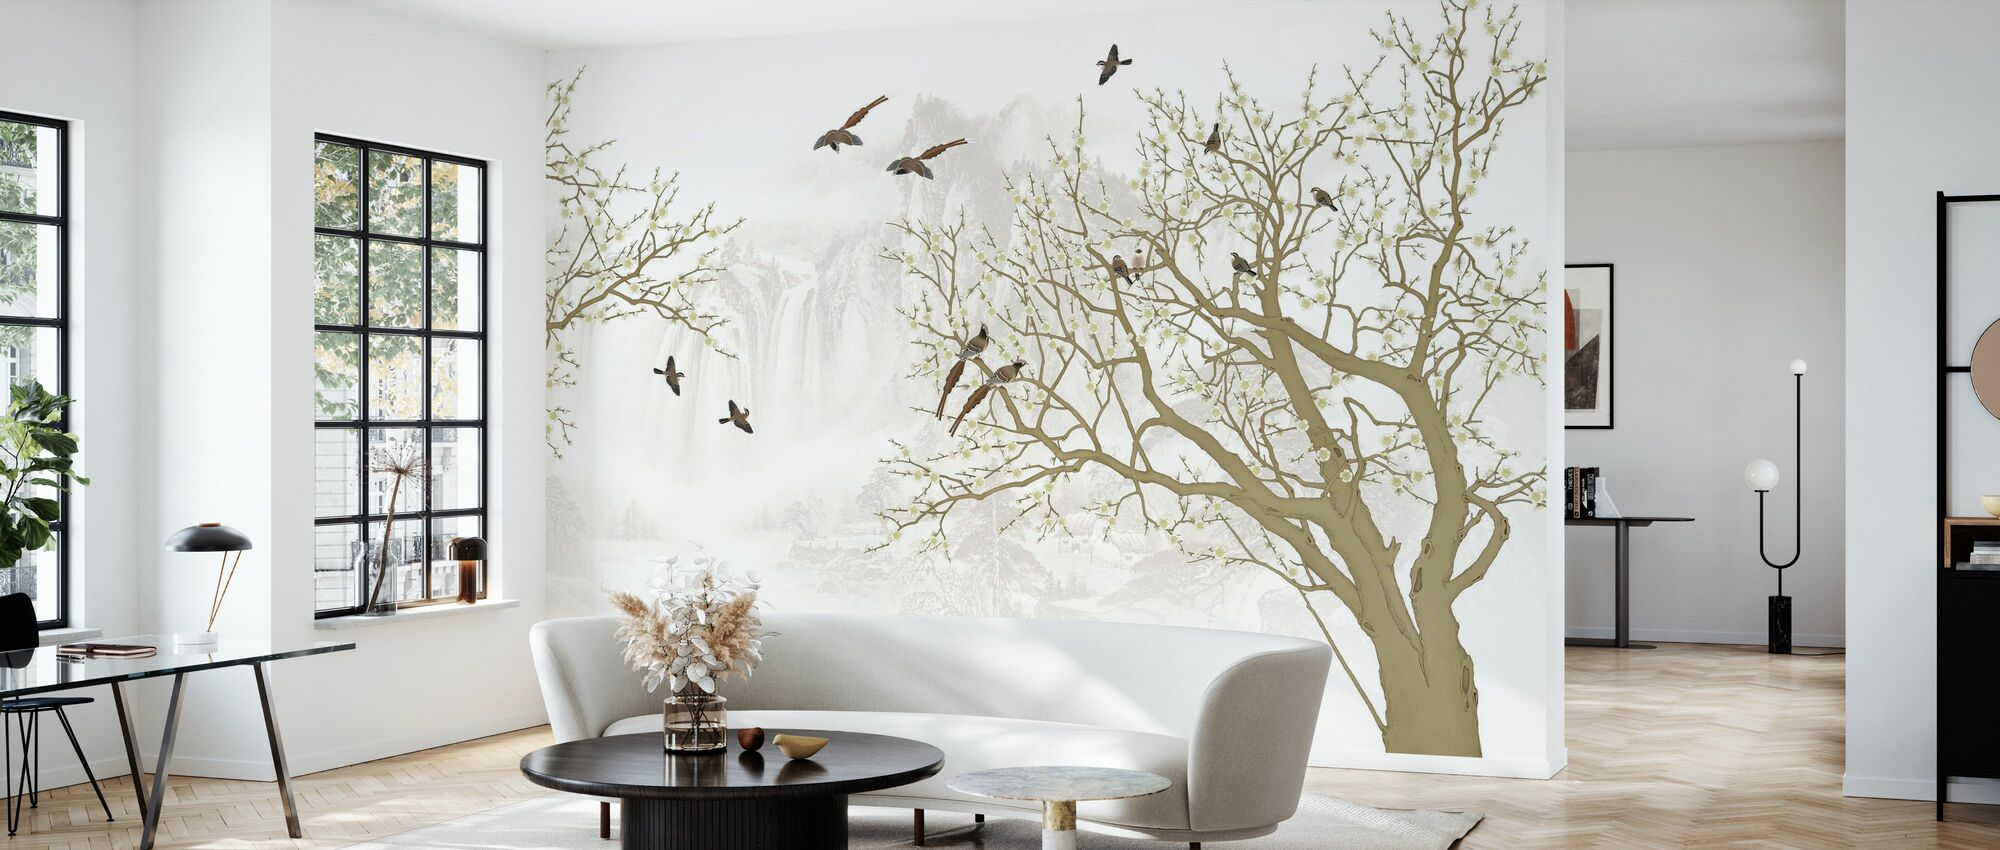 Fåglar Hem - Tapet - Vardagsrum